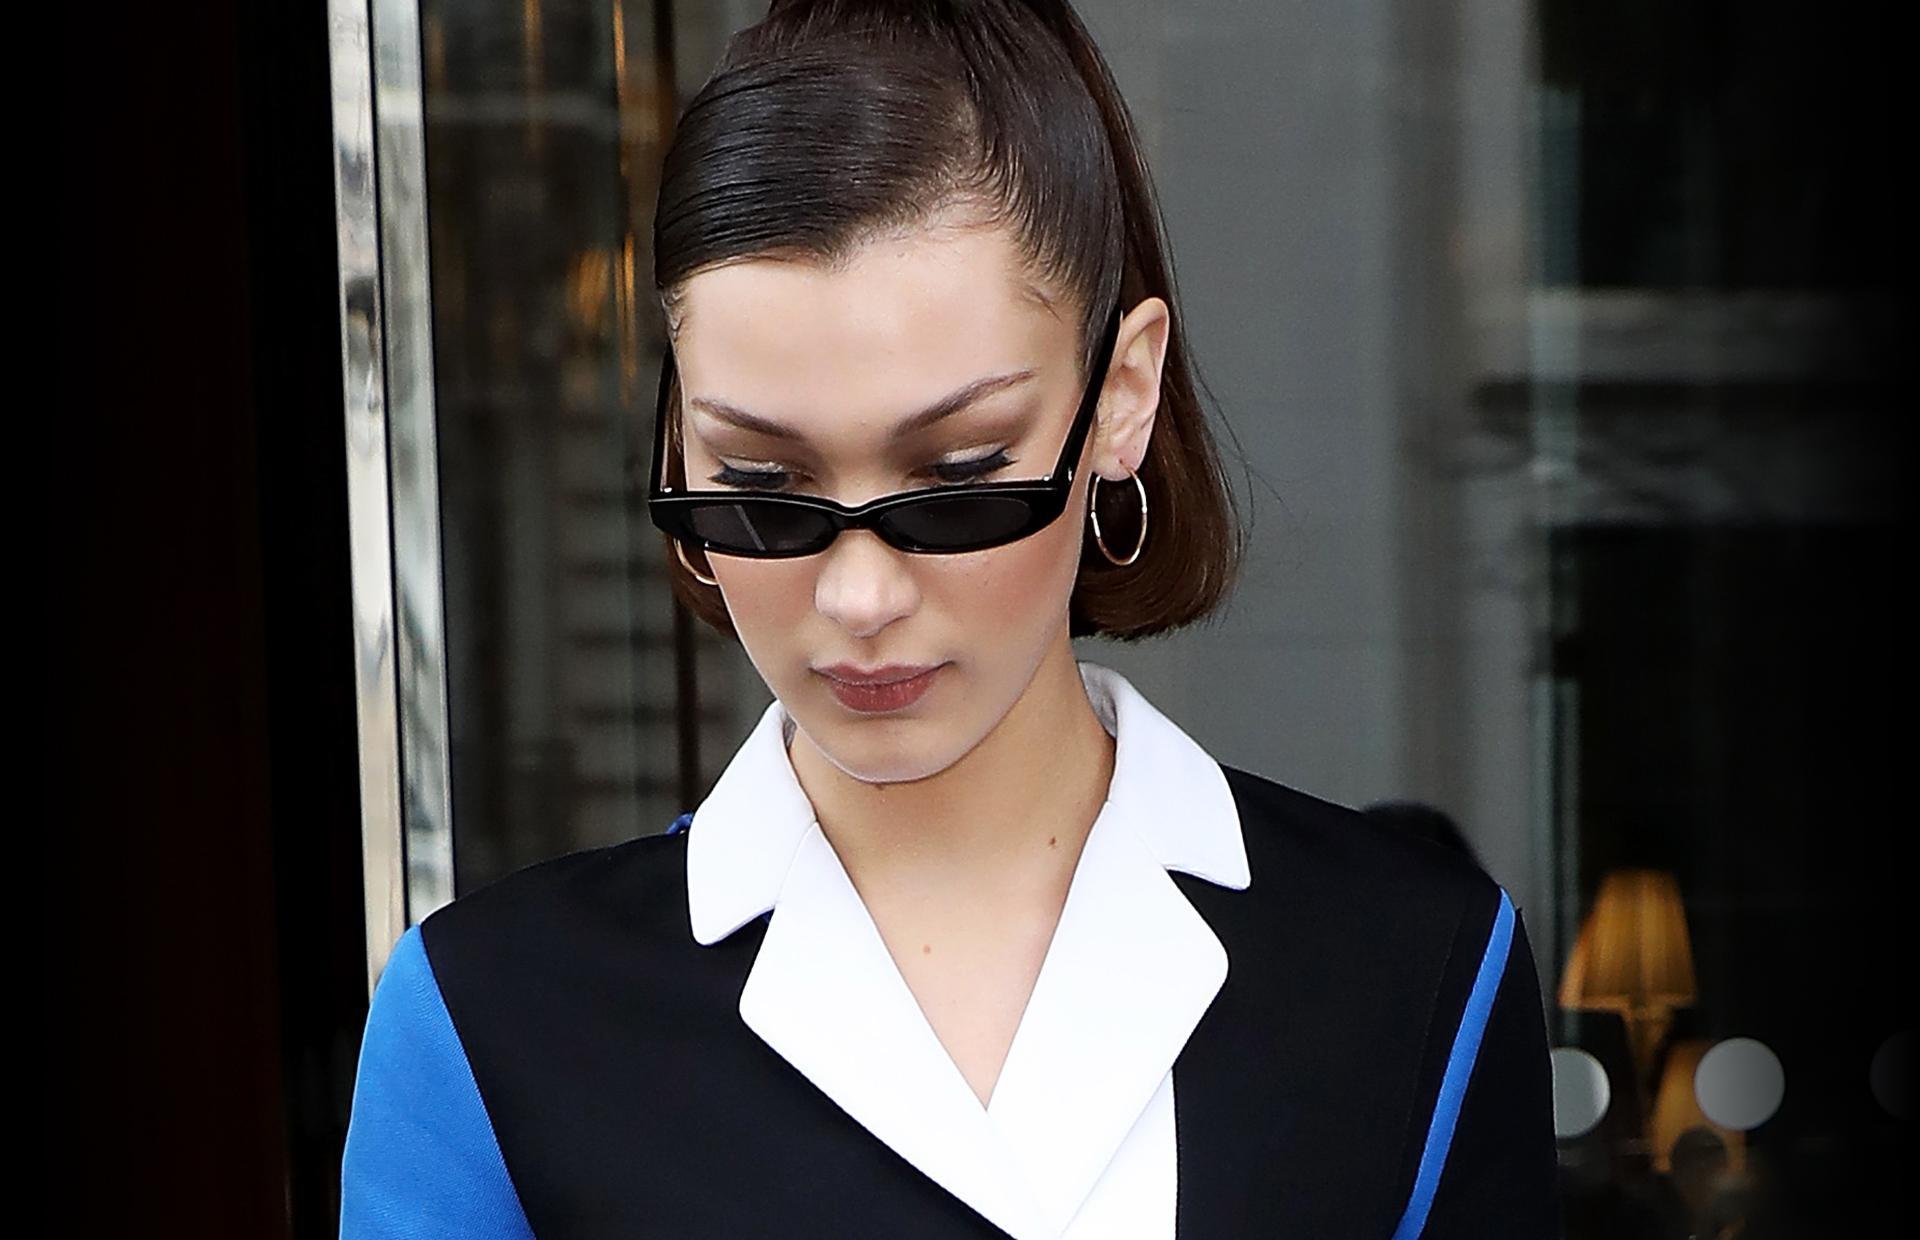 37fd1e31fbe9 Узкие очки — главный тренд 2018 года. Оно вам надо     Мода    РБК Pink